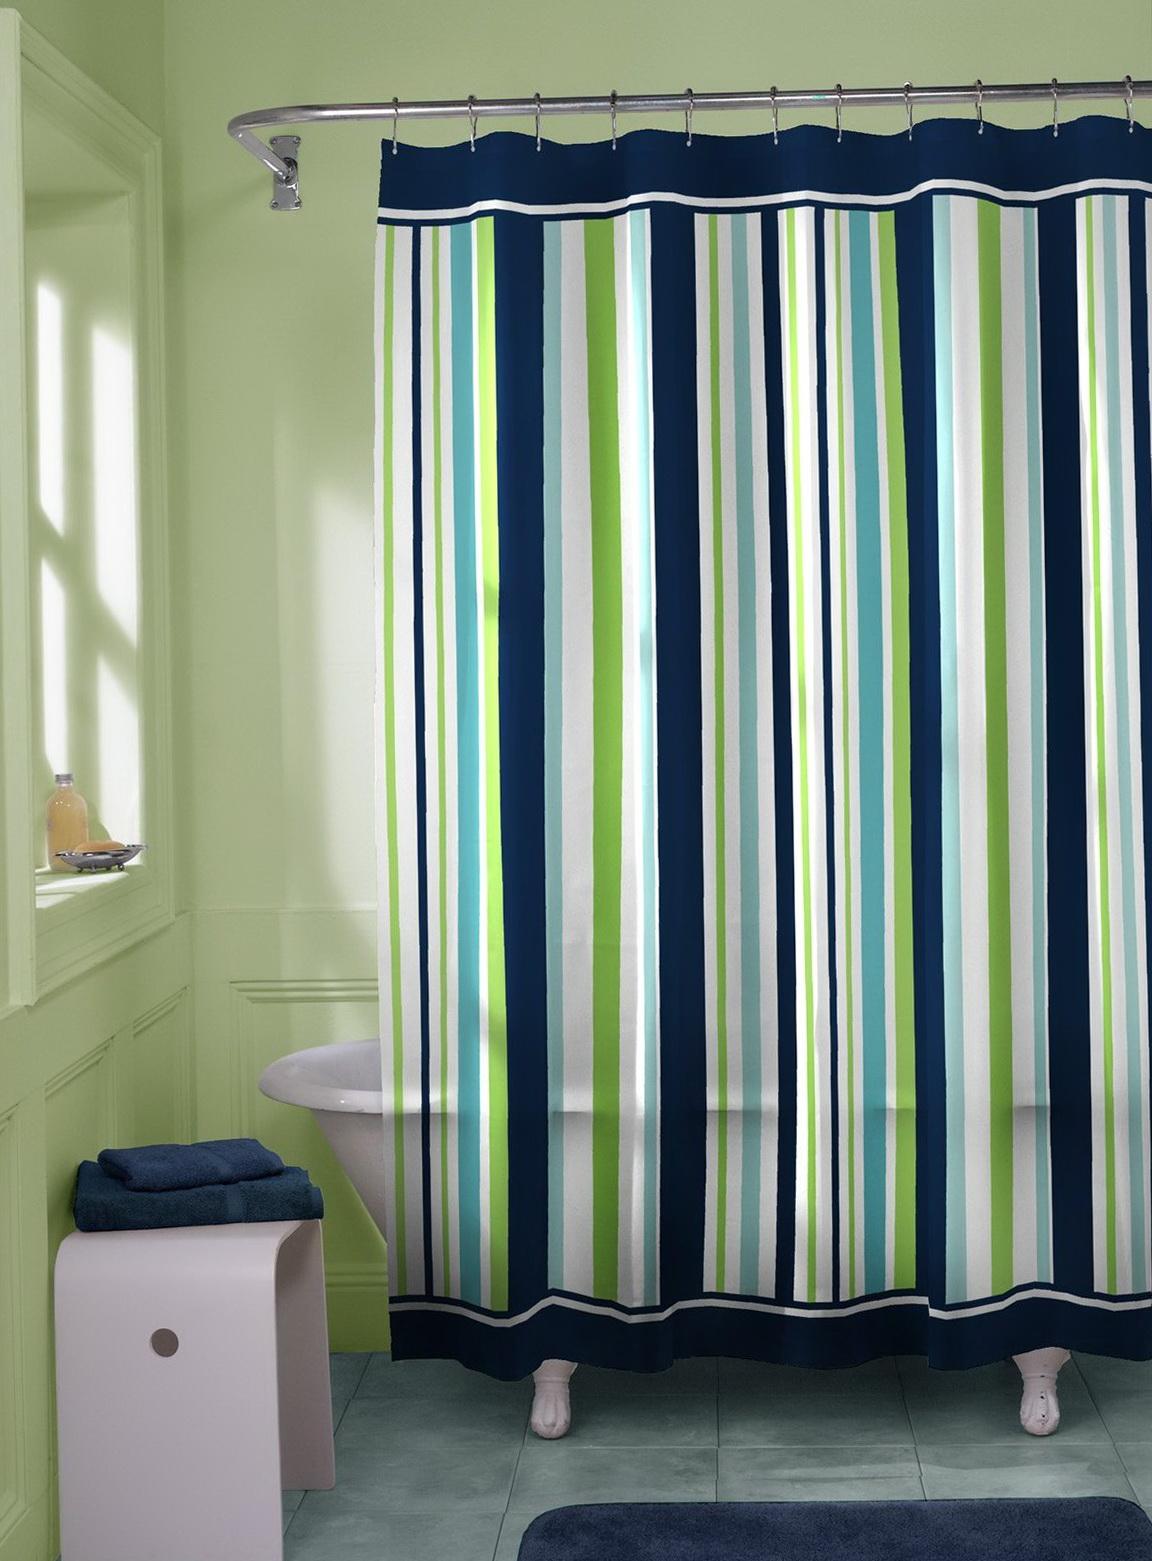 Standard Curtain Length And Width Home Design Ideas